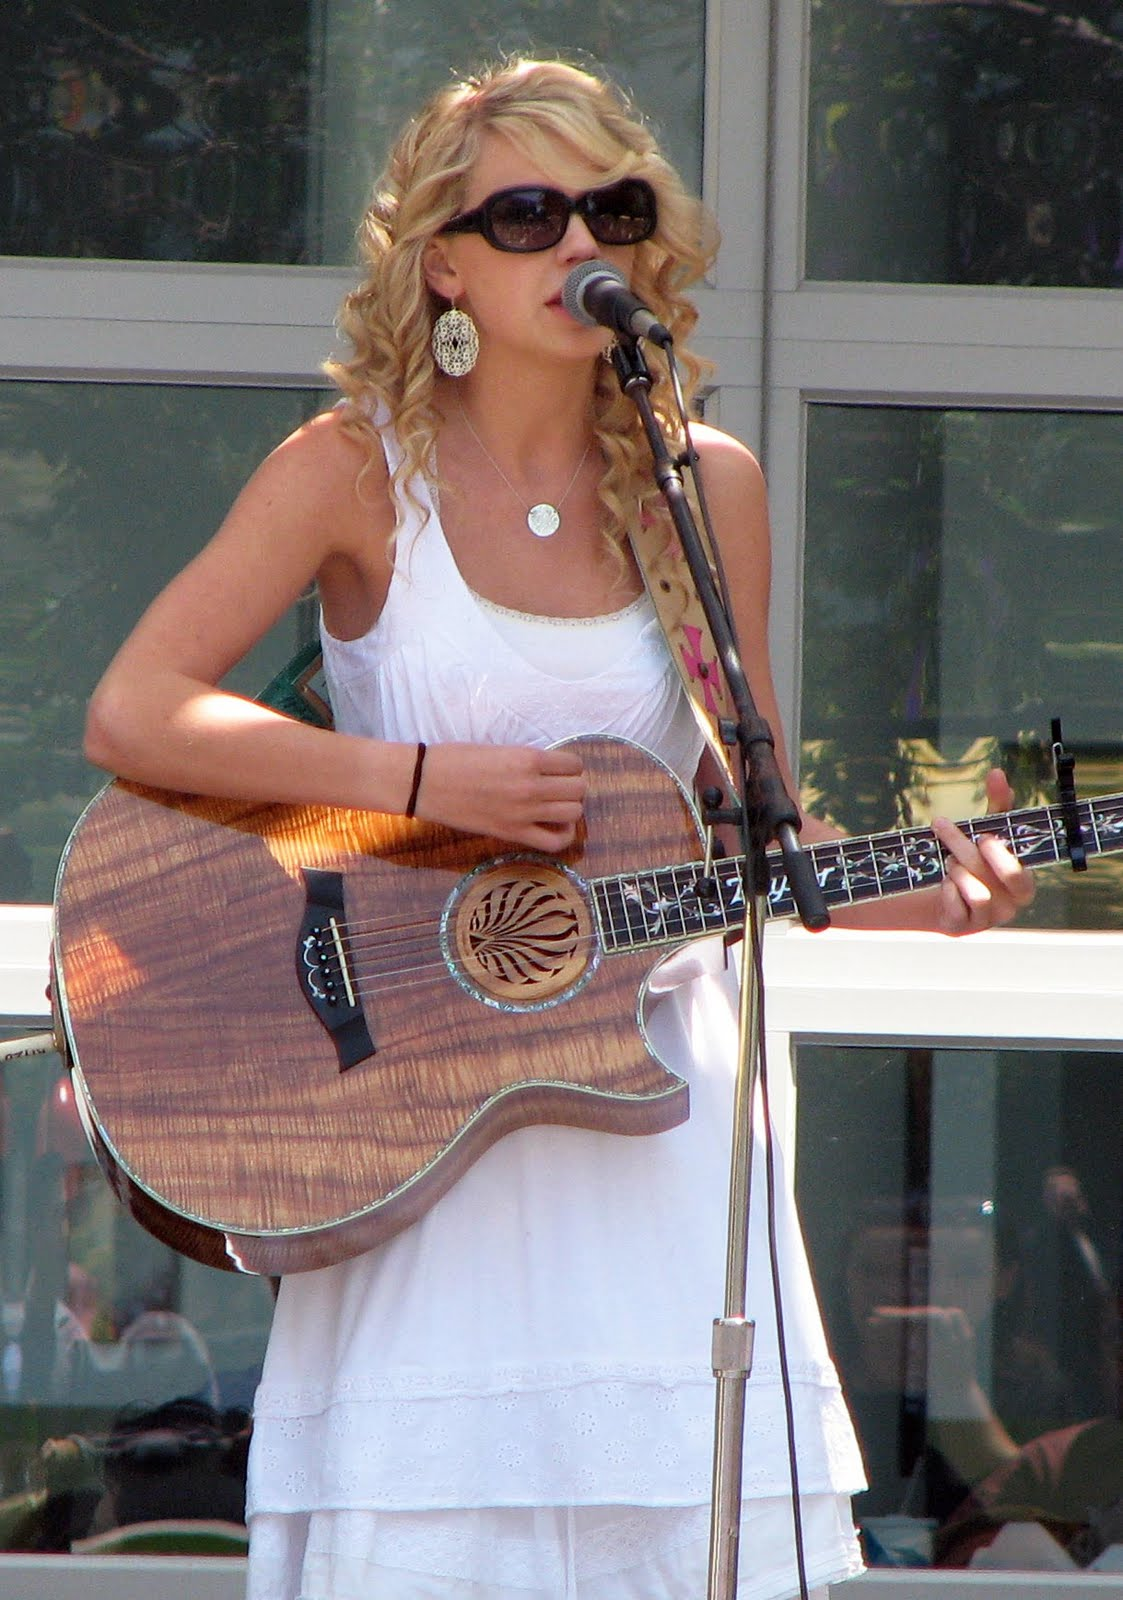 http://4.bp.blogspot.com/-XaA6fO0ZWxo/TdKAhoVIyPI/AAAAAAAAAIE/M_ETPX-5Hek/s1600/Taylor+Swift+-on+stage+performance+view.jpg